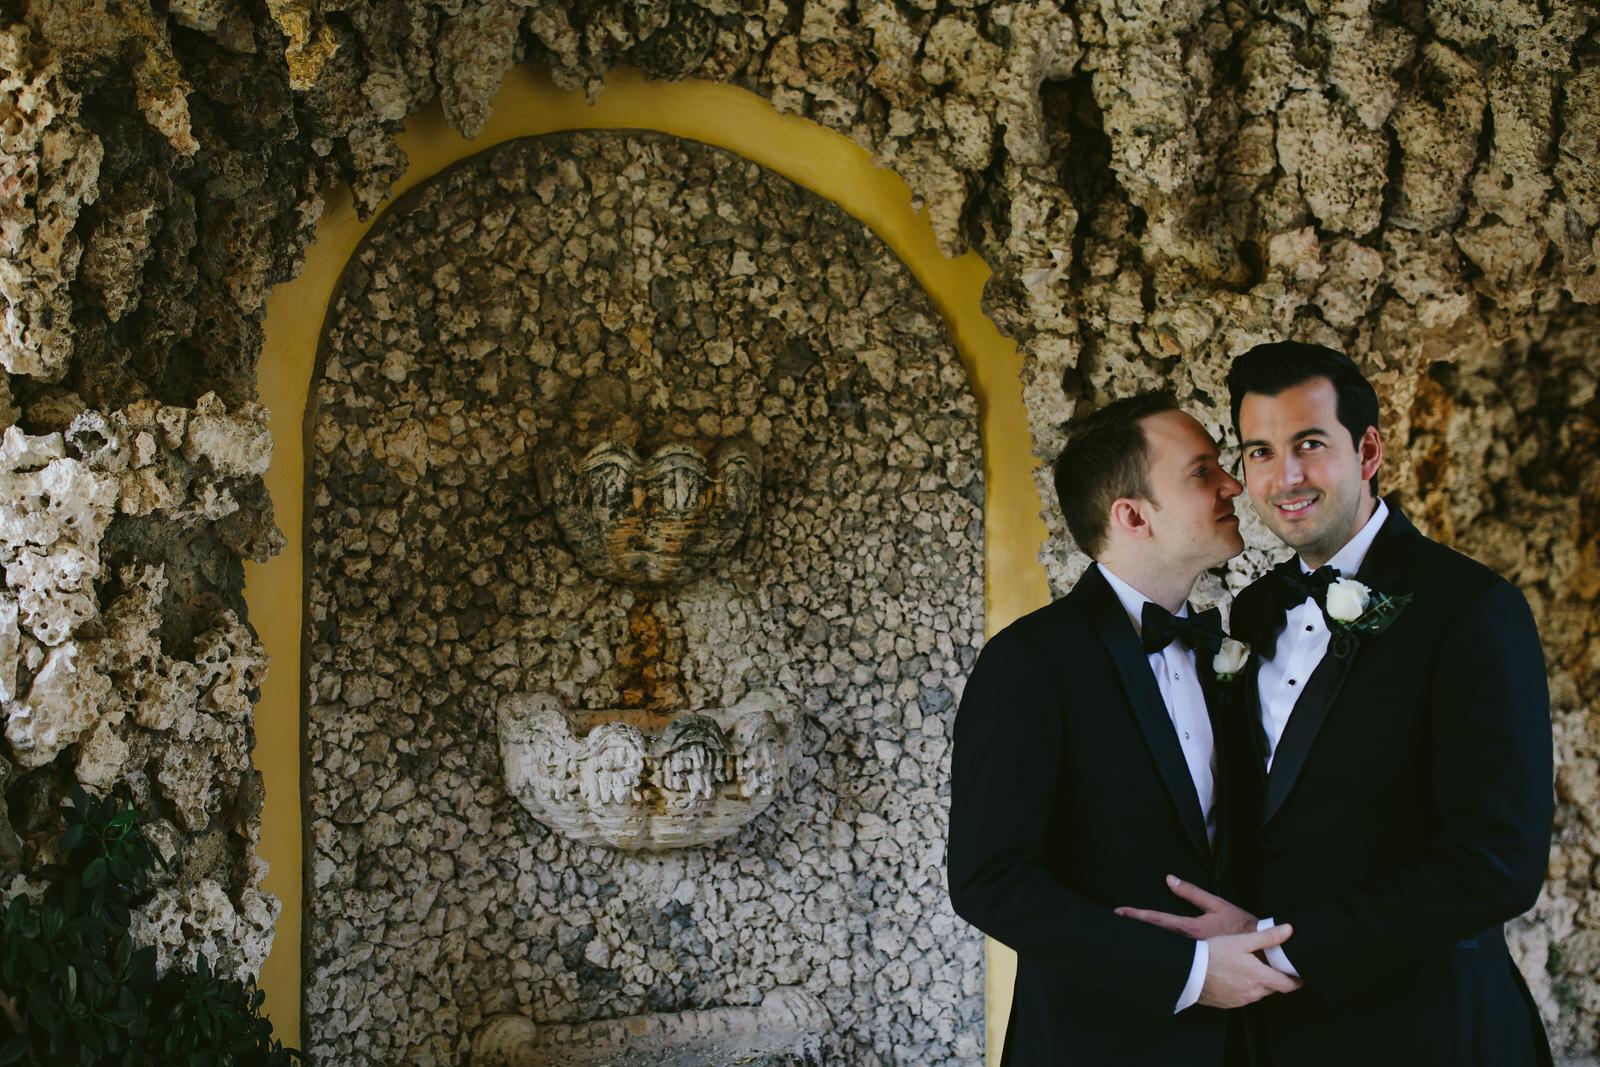 vizcaya_elopement_intimate_wedding_portraits_tiny_house_photo-16.jpg